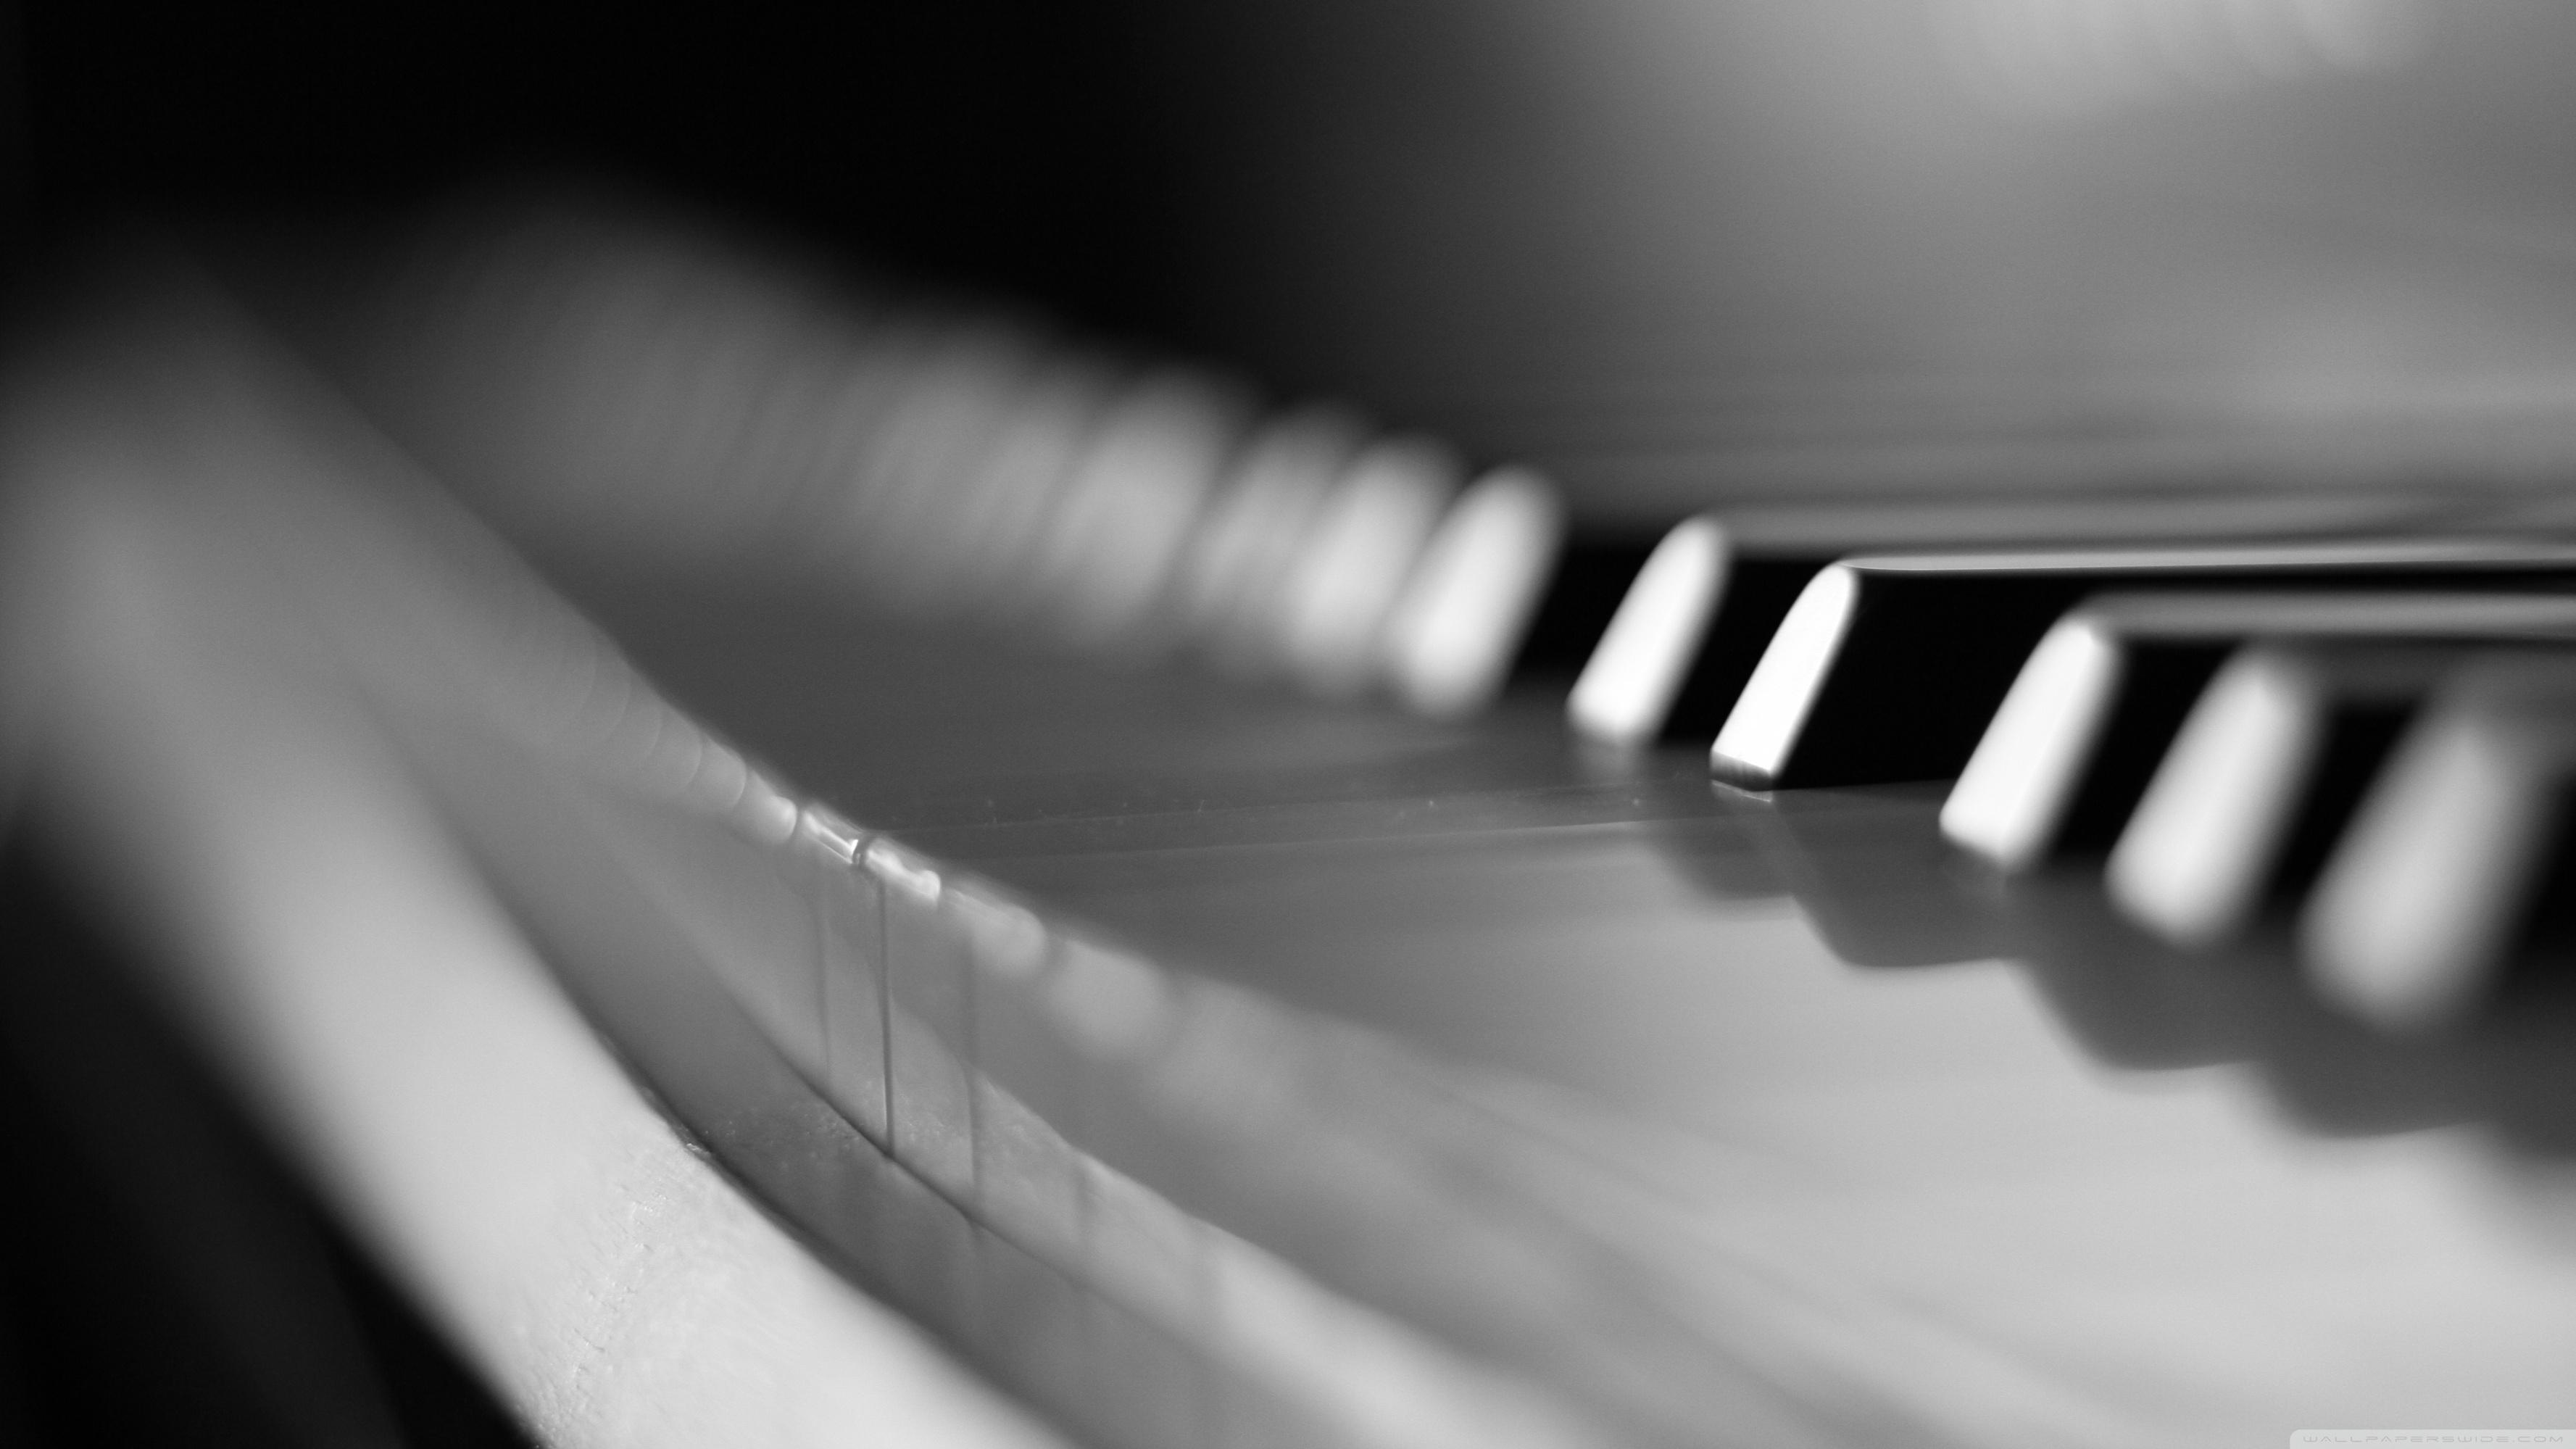 Piano Letter Macro